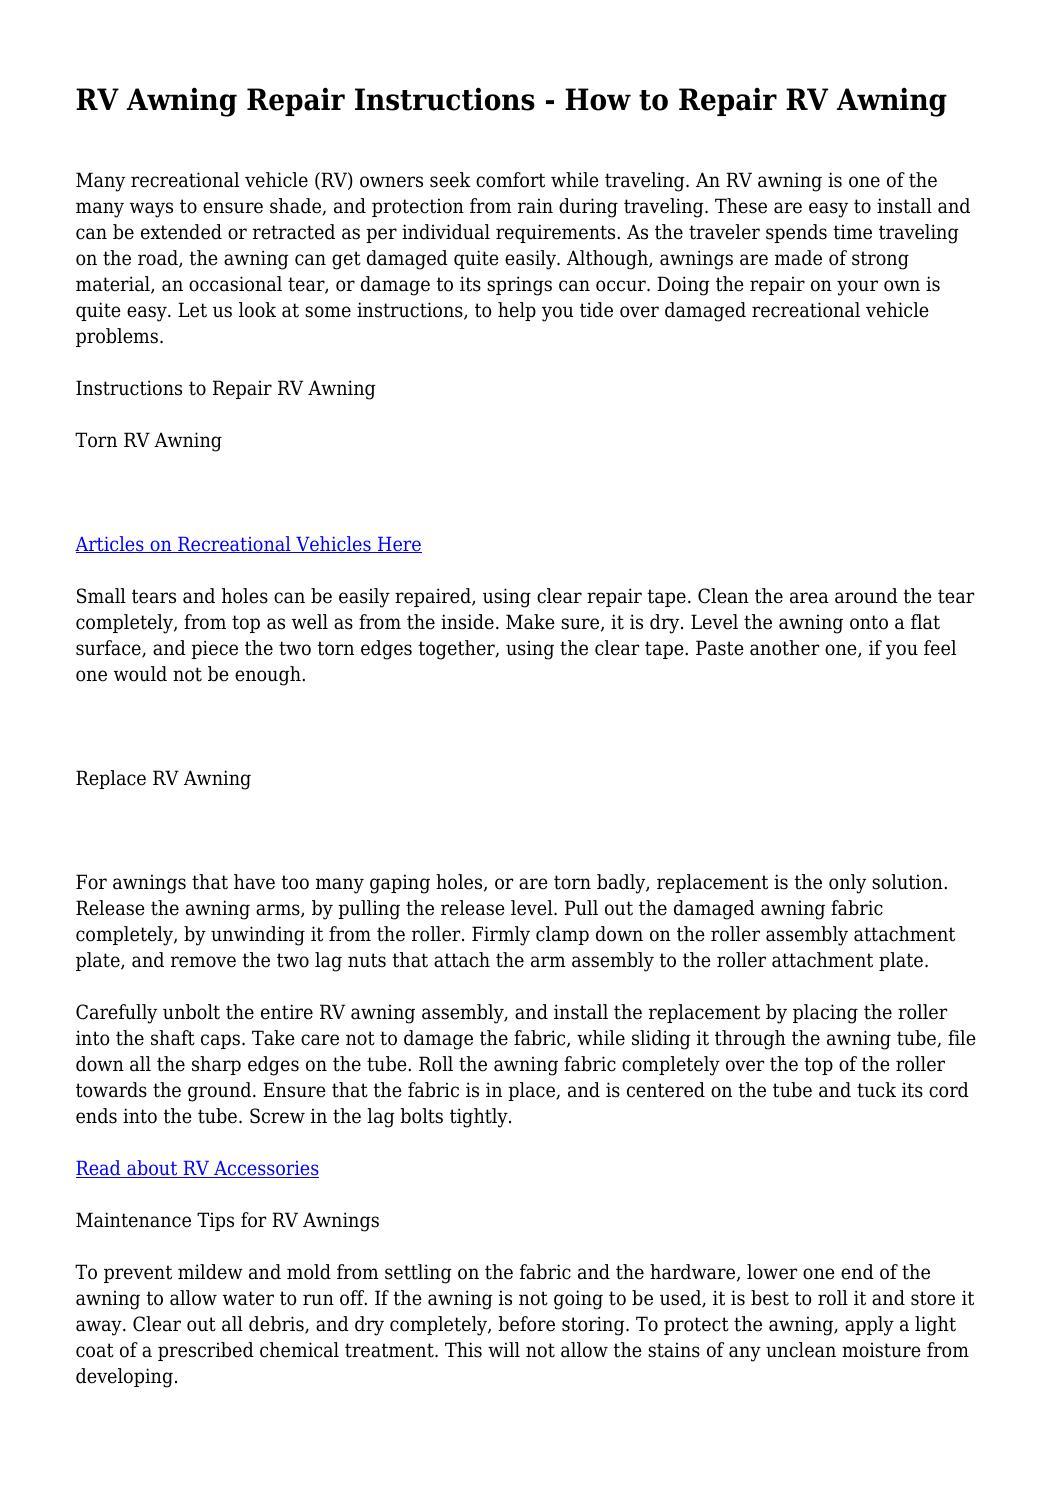 RV Awning Repair Instructions - How to Repair RV Awning by  snottyexpenditu68 - issuu